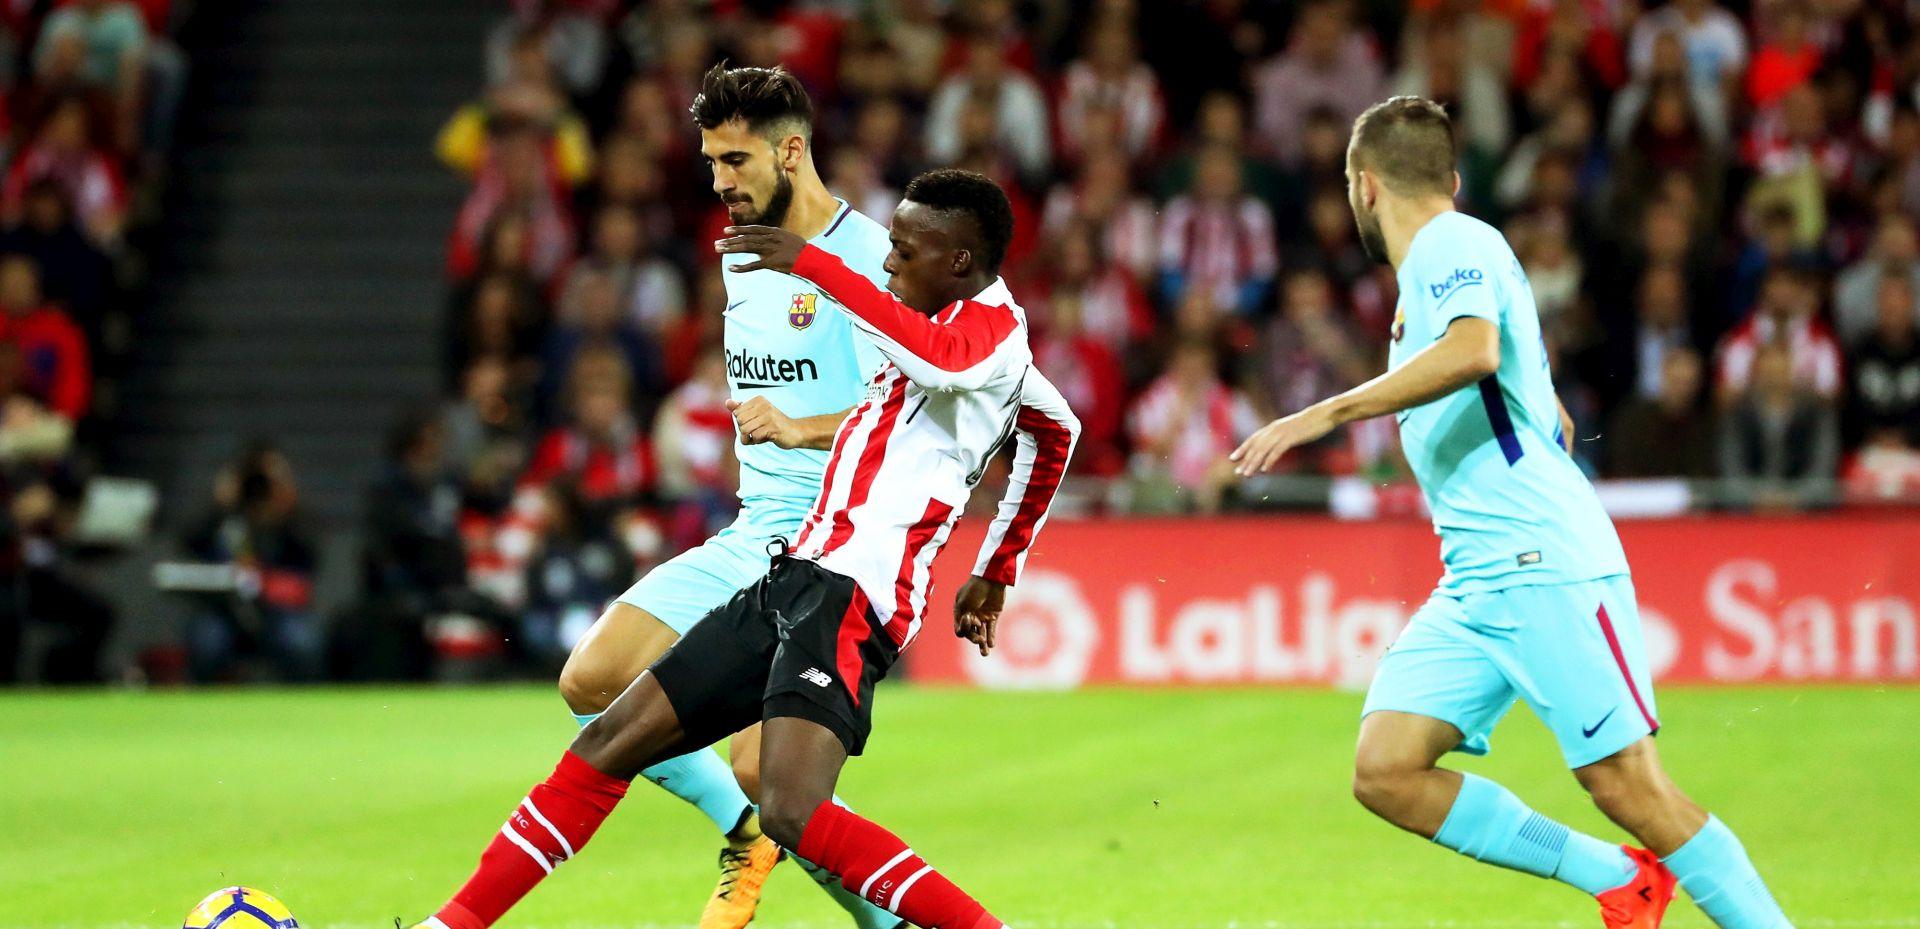 Barcelona – Athletic Bilbao 2-0